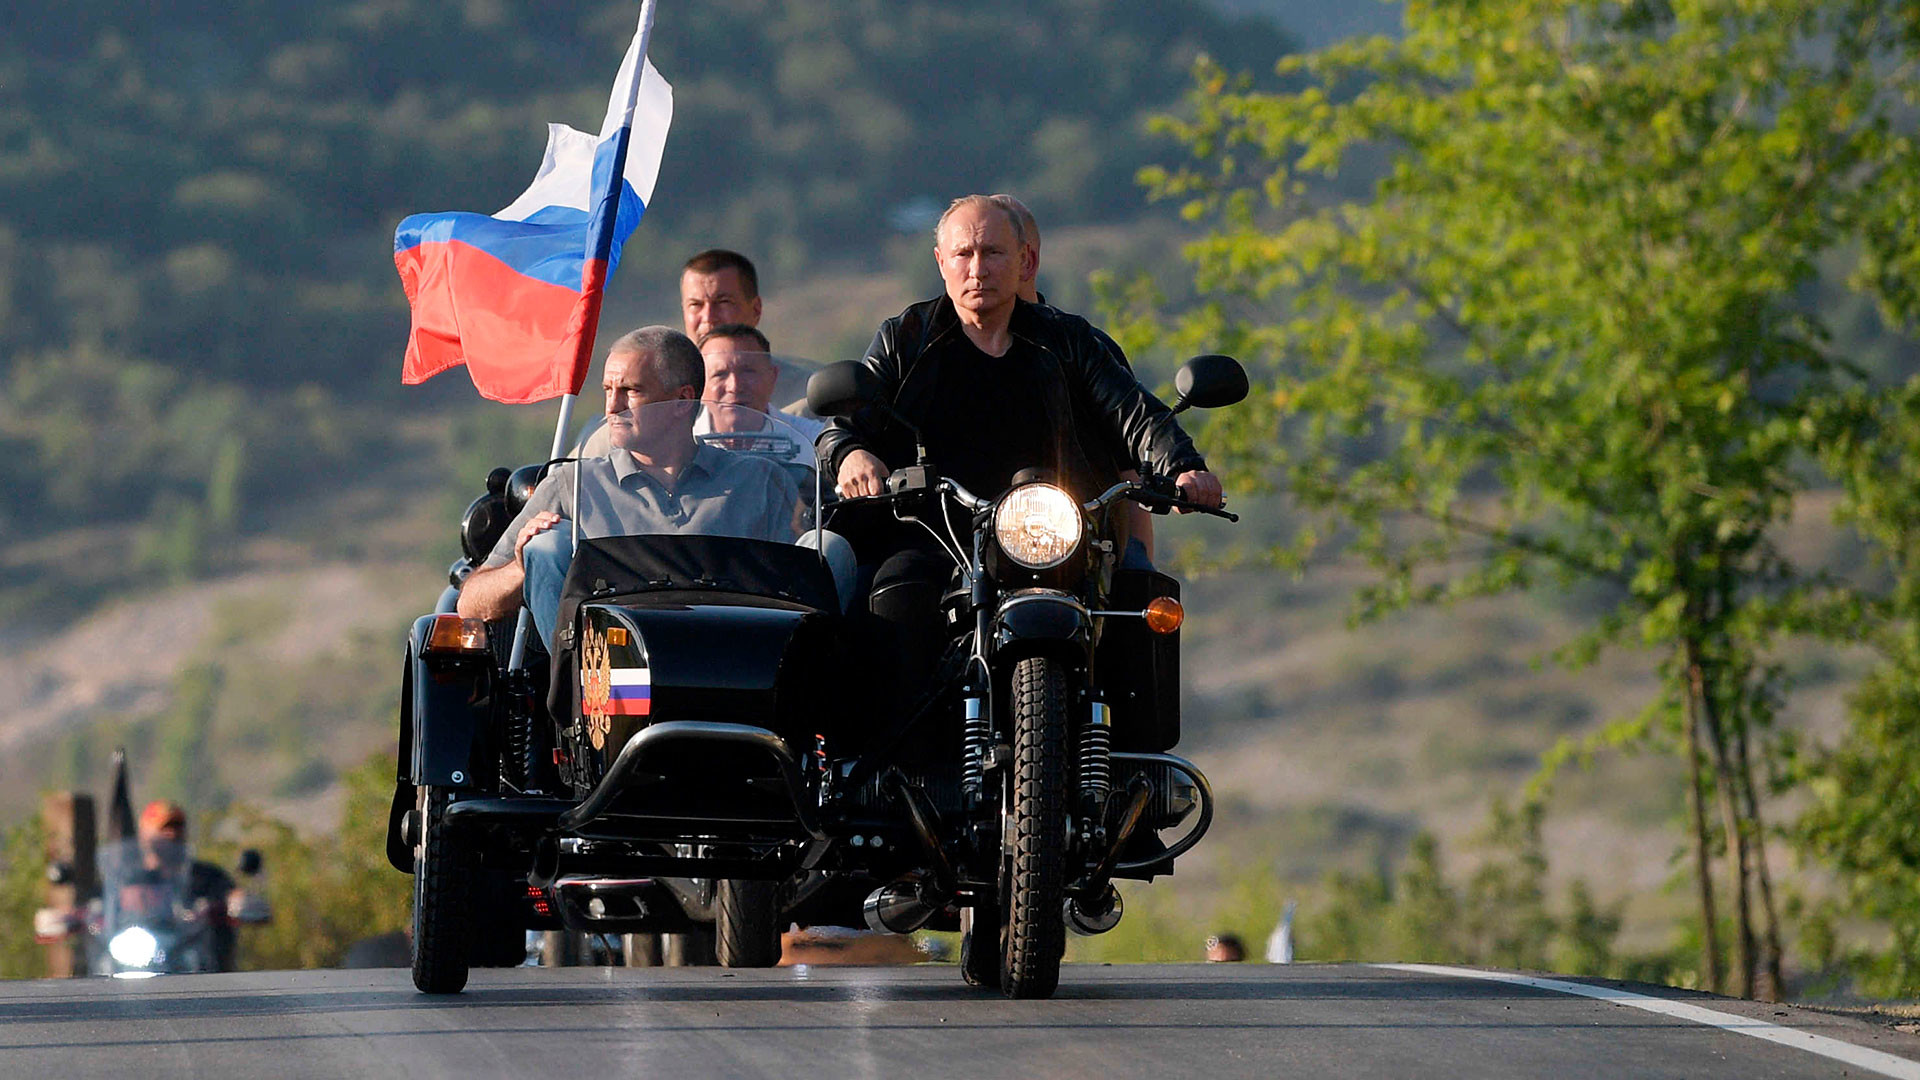 Presiden Rusia Vladimir Putin mengendarai sepeda motor Ural dengan sespan selama pameran sepeda motor internasional di Sevastopol, Krimea, 10 Agustus 2019. Putin berkendara bersama Kepala Republik Krimea Sergey Aksenov (kiri).